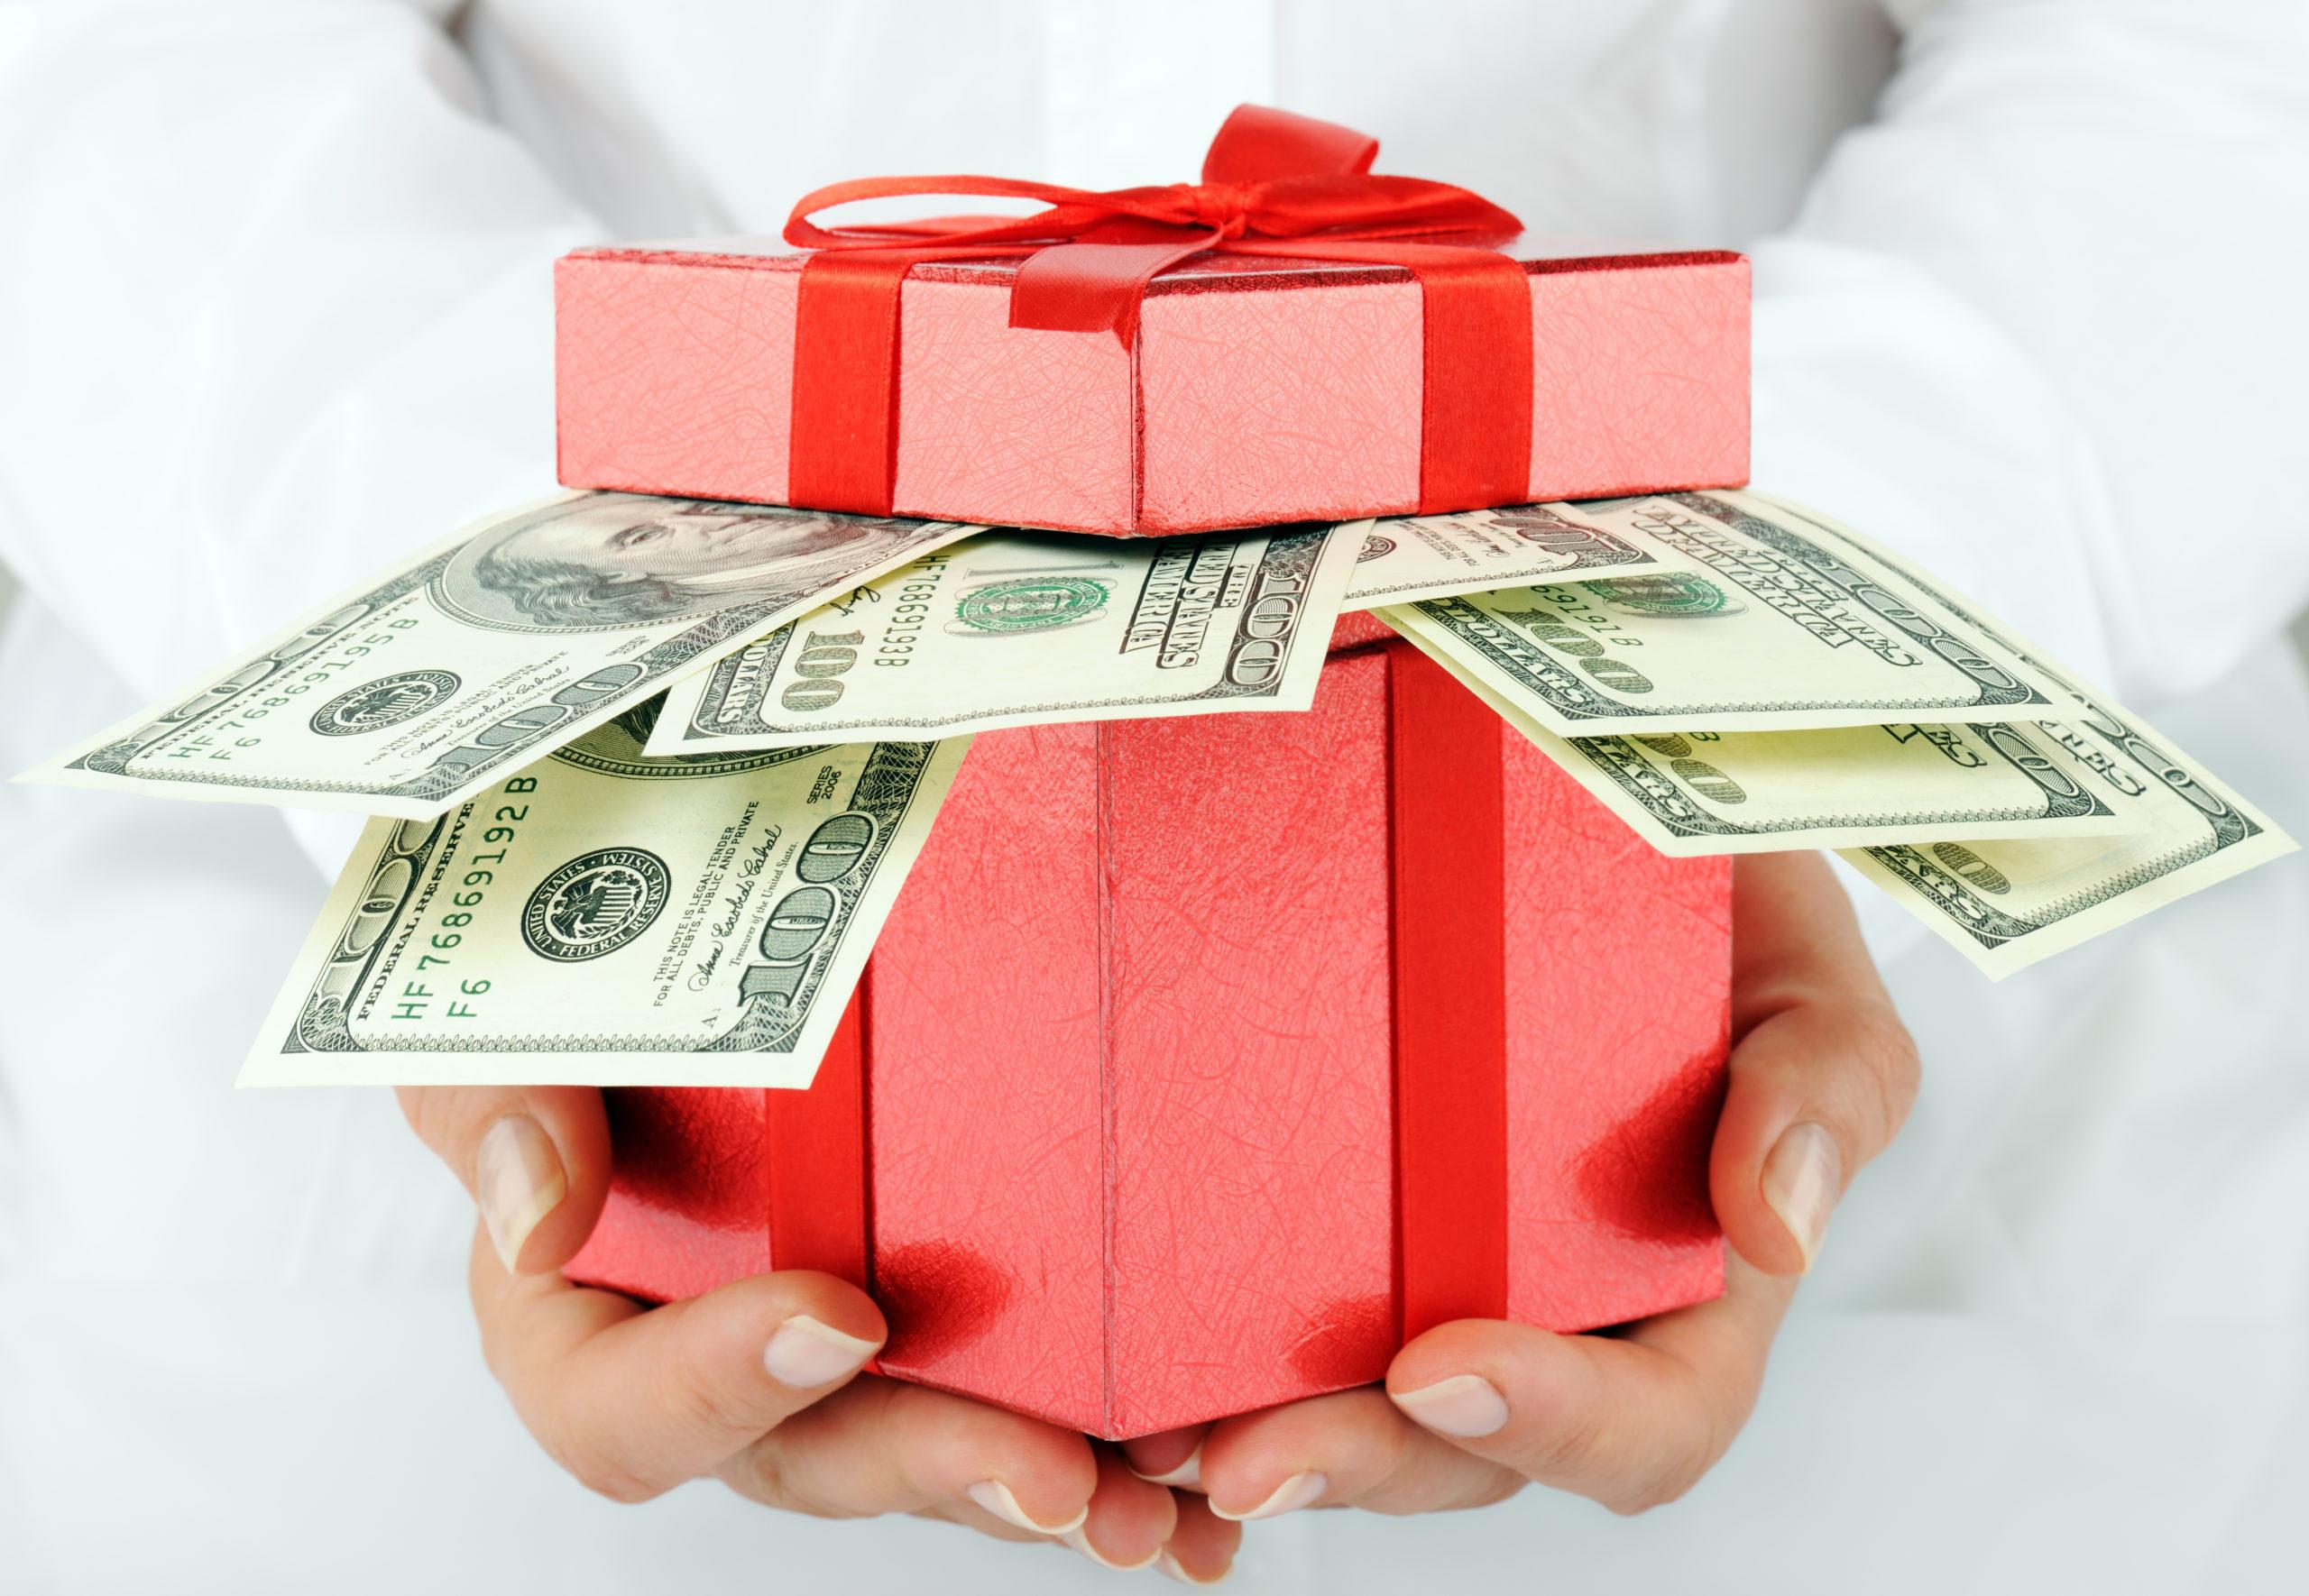 Red box gift containing 100 dollar bills